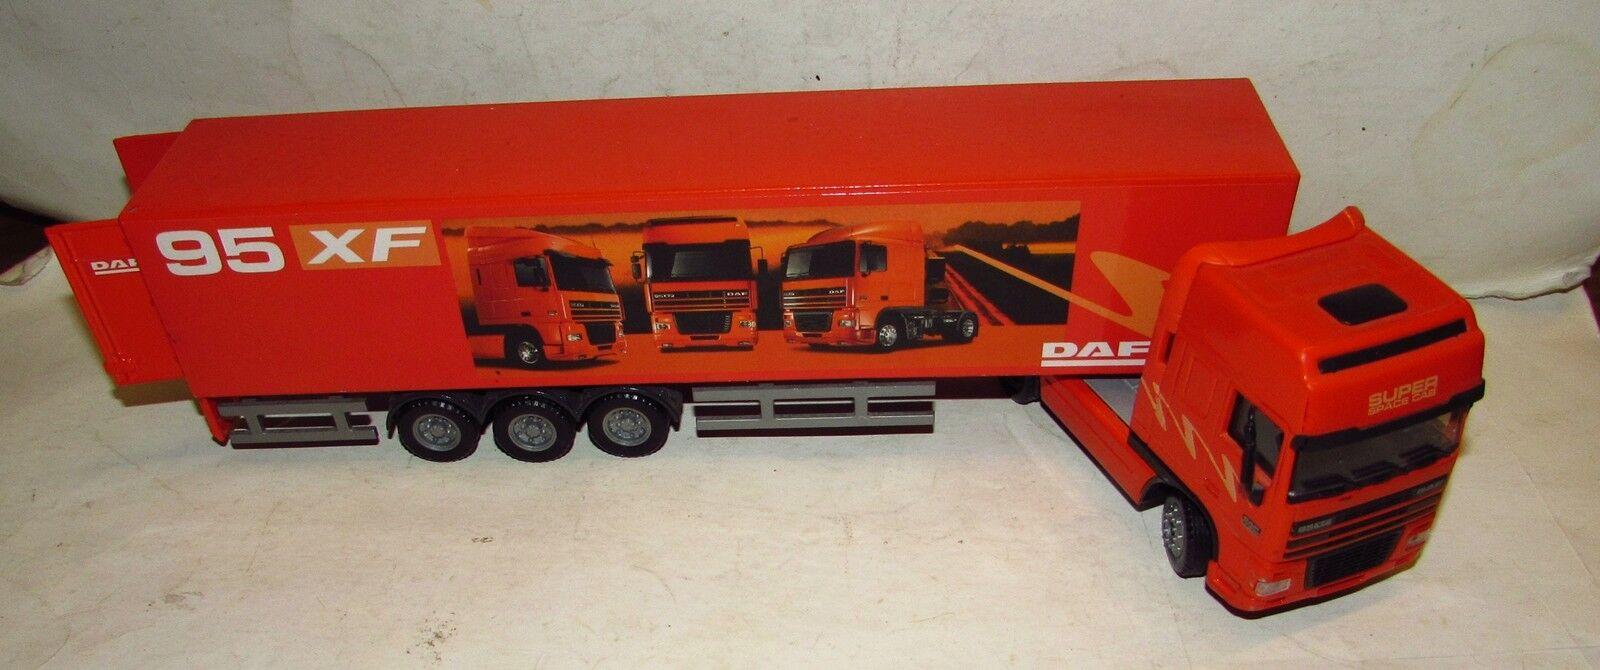 Joal 1 50 Daf 95 XF arancione 33,5 cm